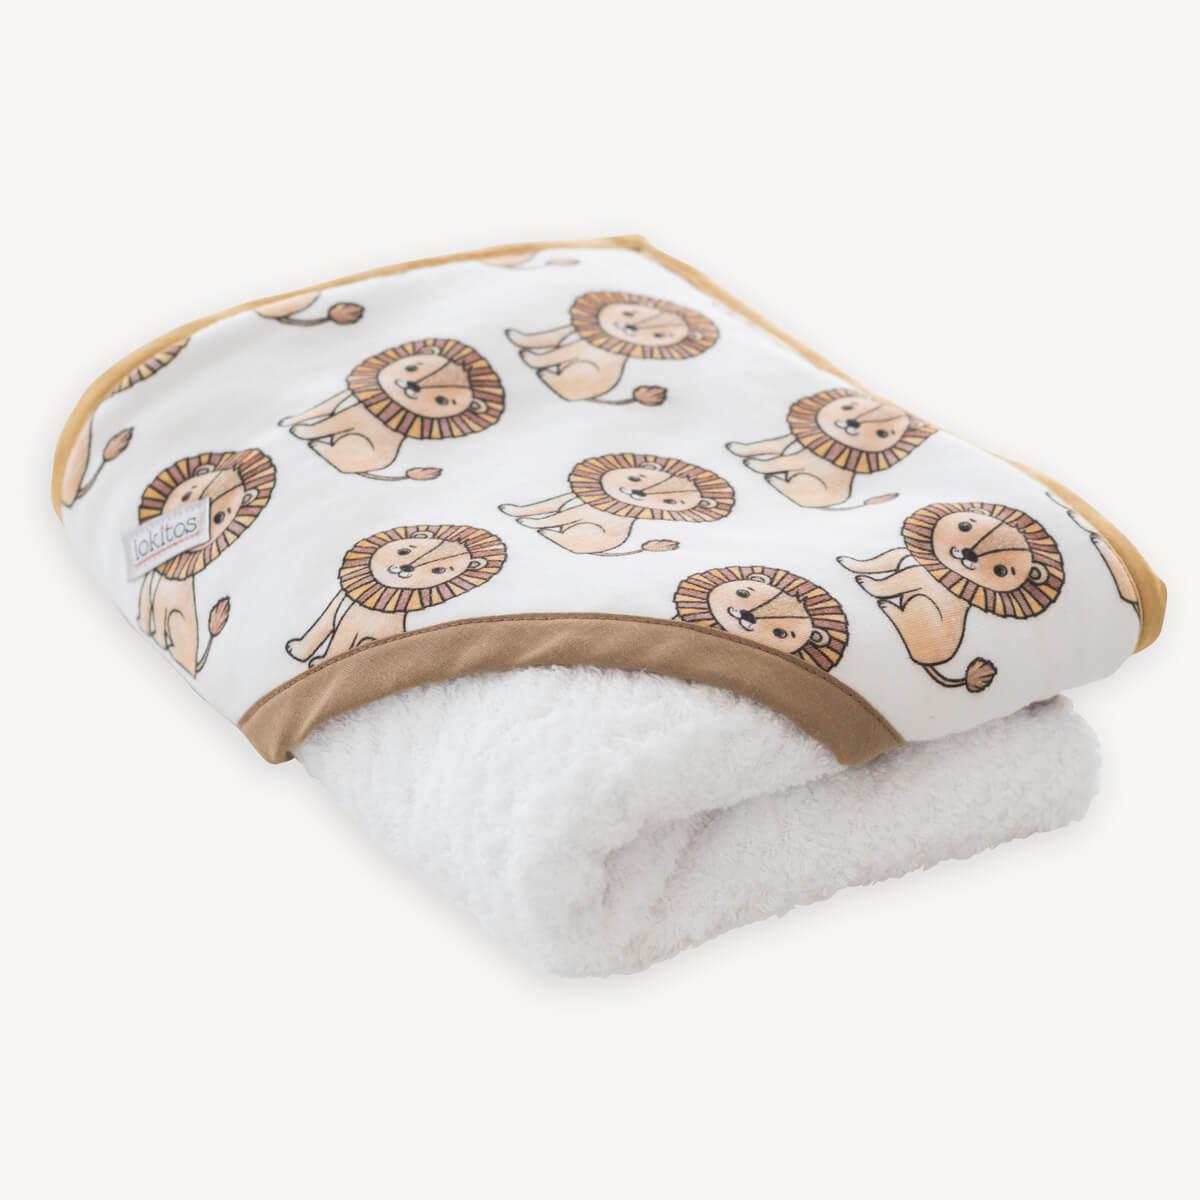 capa de baño de leones